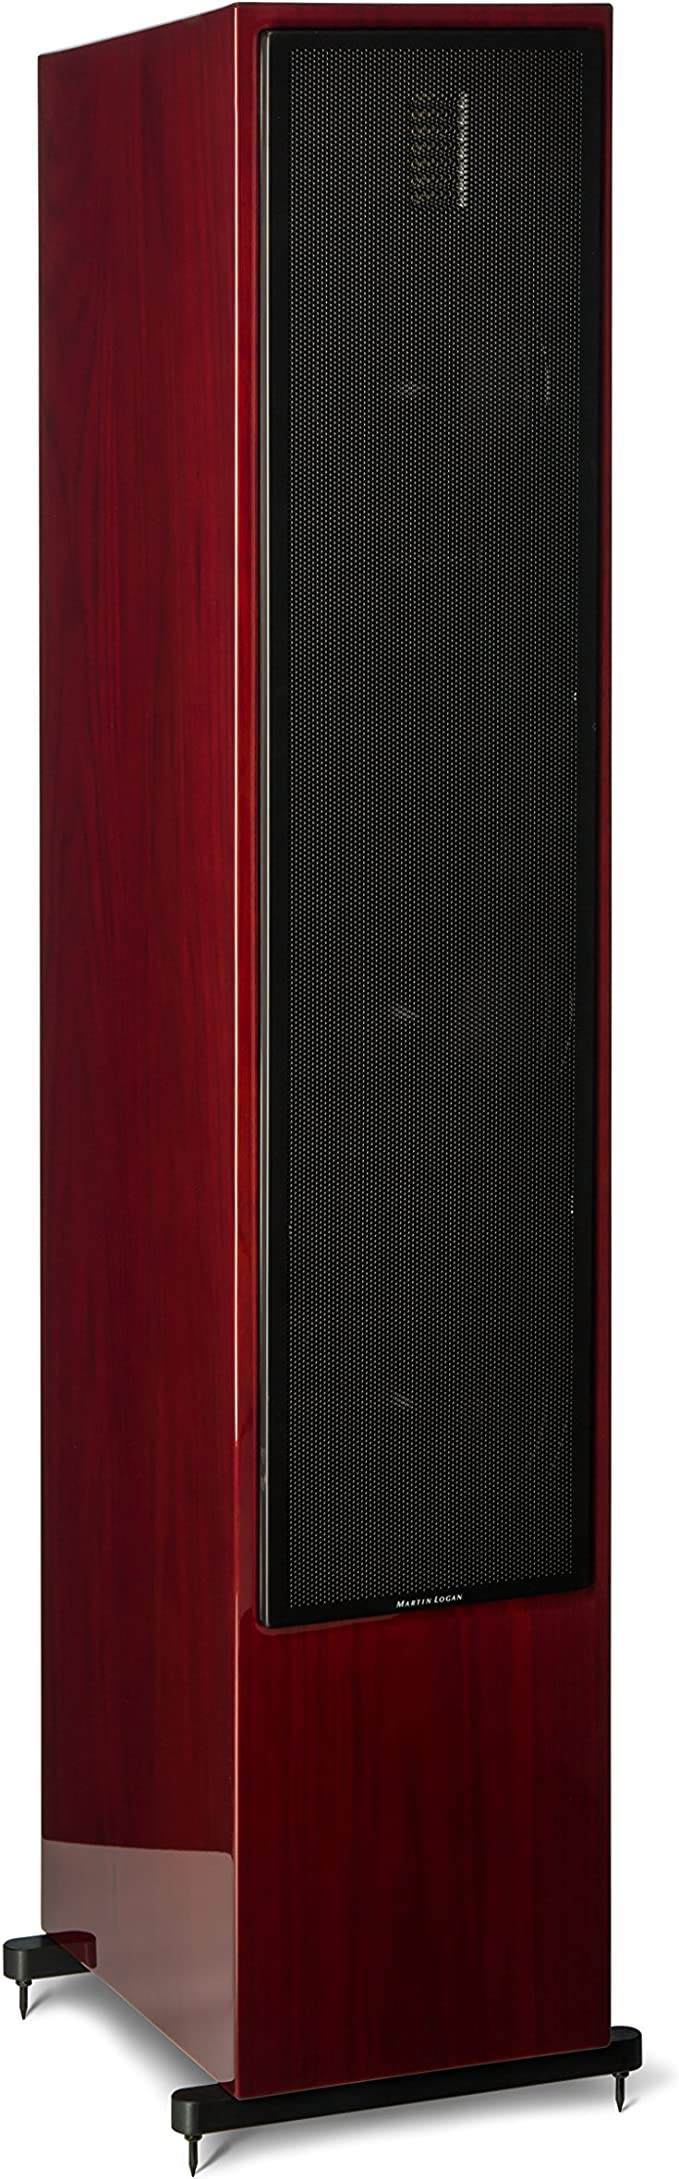 MartinLogan Motion 60XT Floor Standing Speaker - Gloss Black Cherrywood - Each